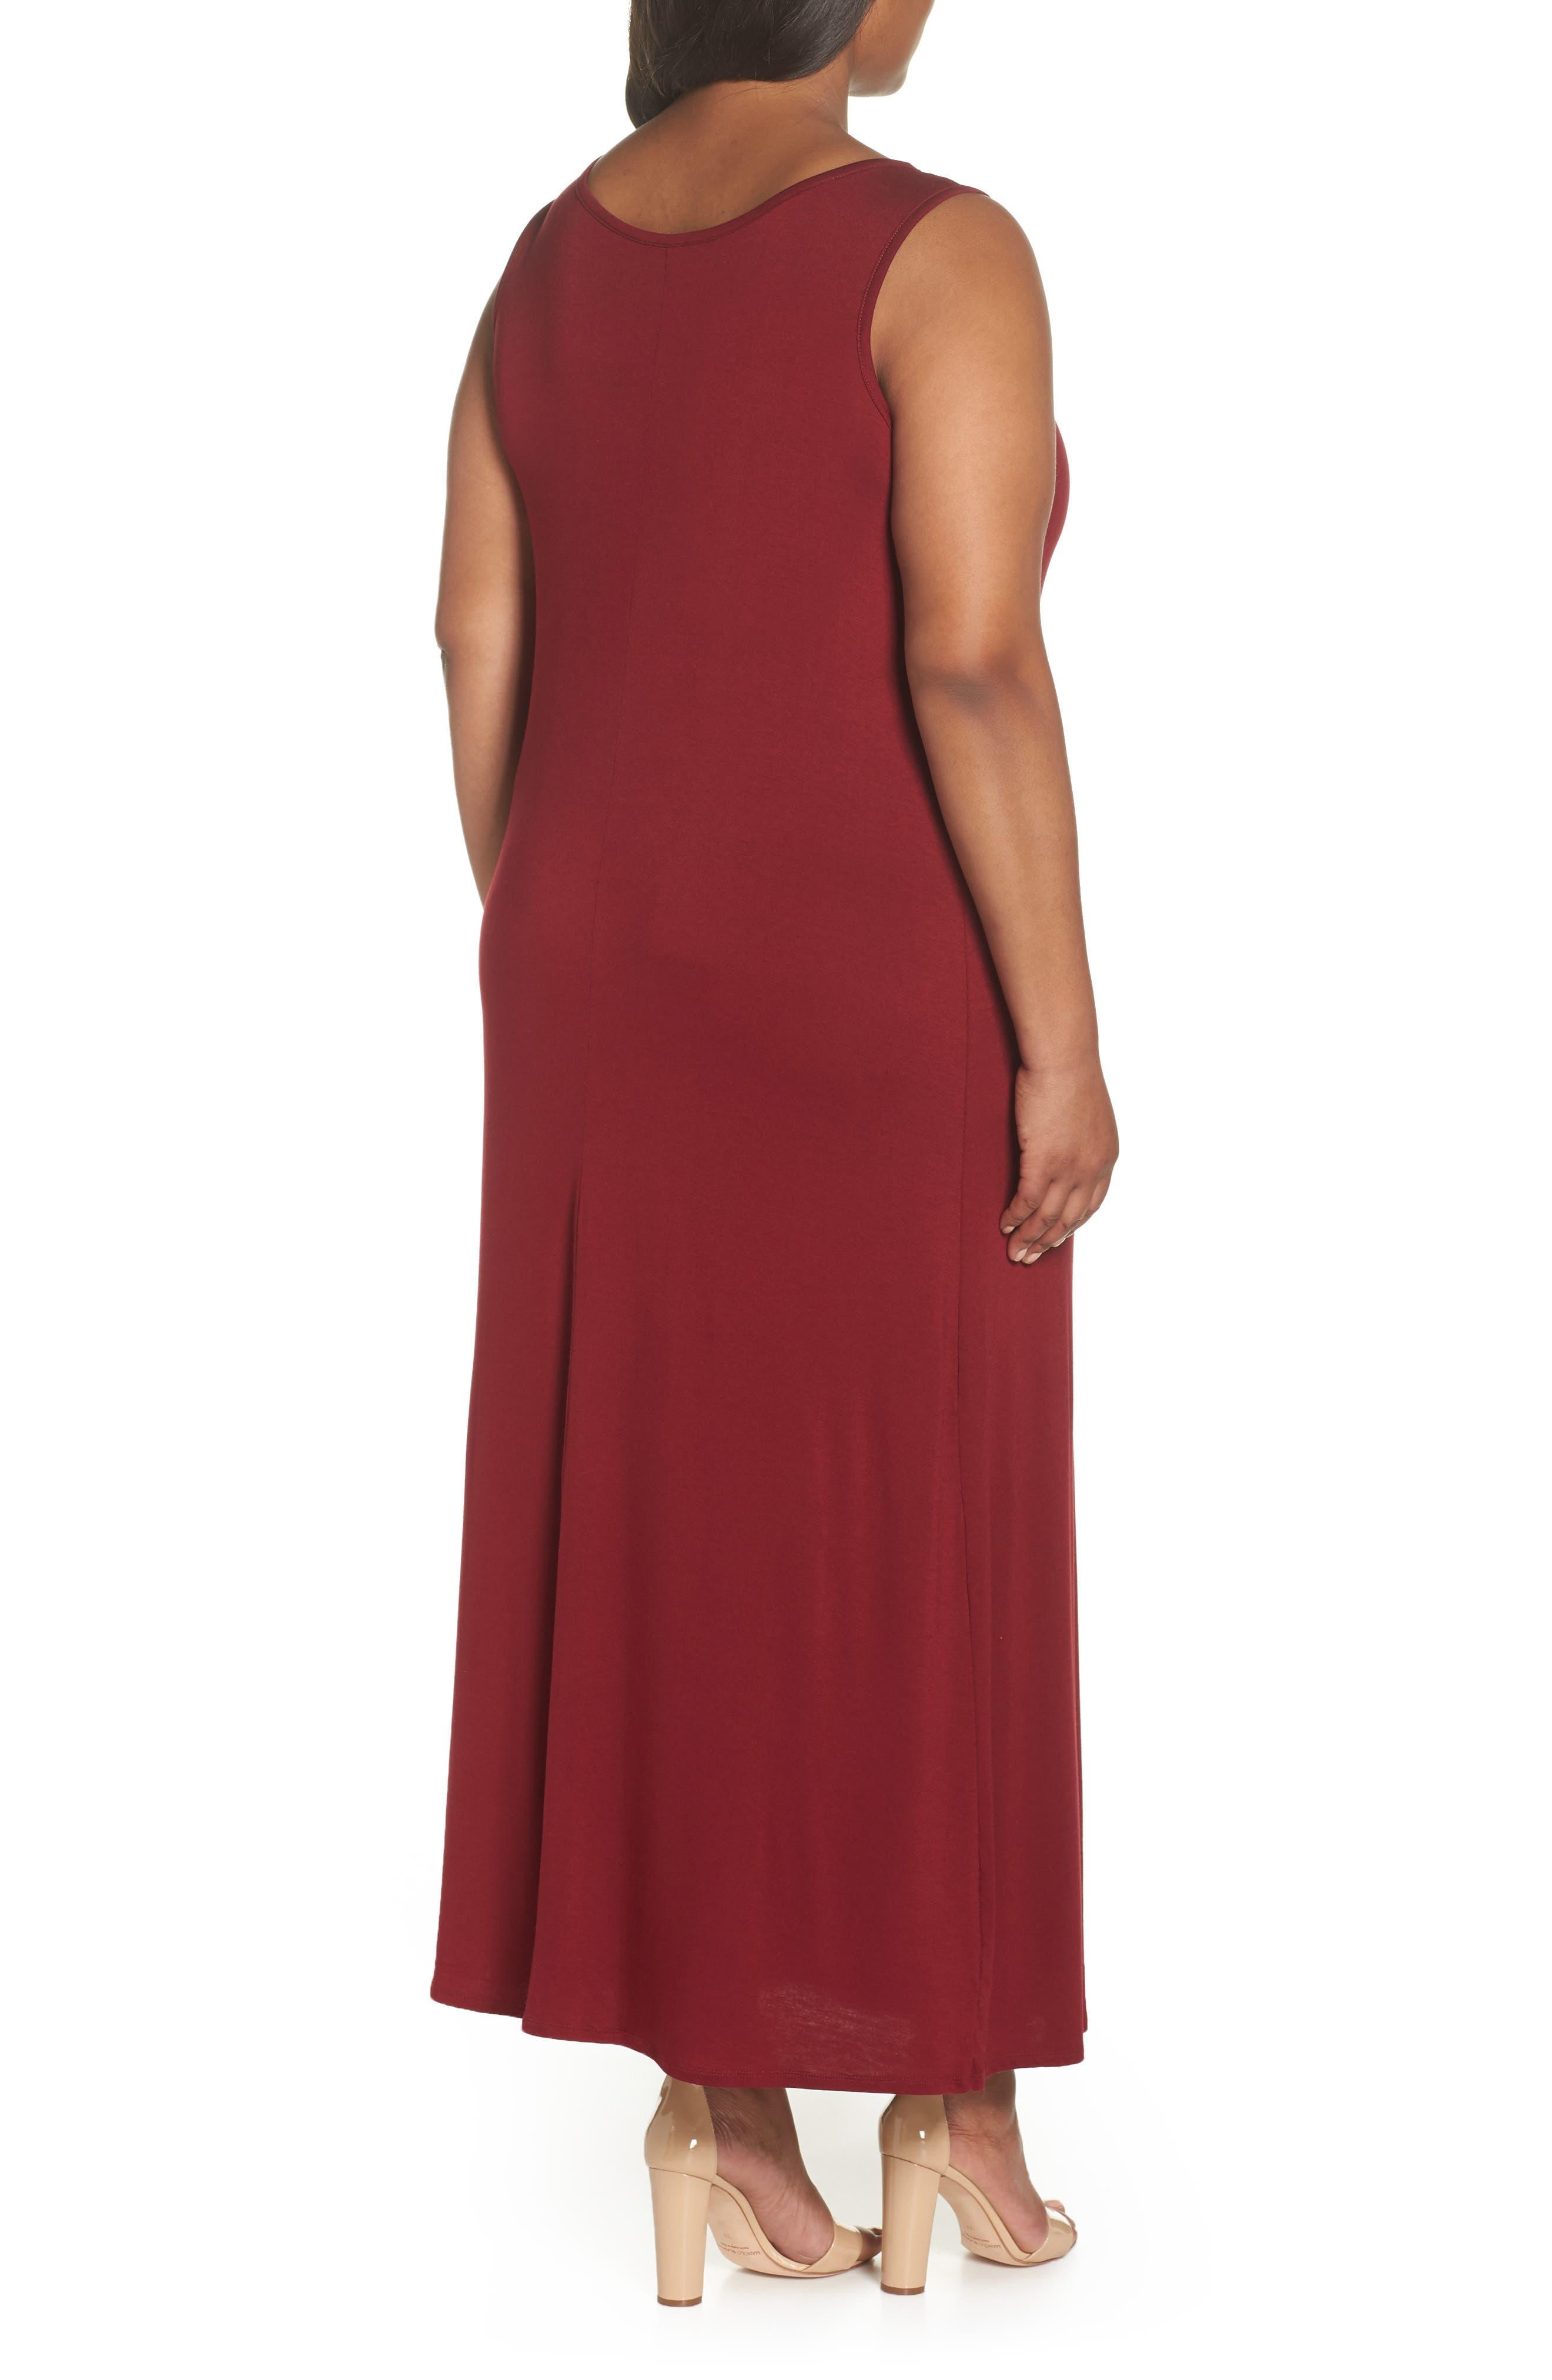 Tie Strap Knit Maxi Dress,                             Alternate thumbnail 2, color,                             606